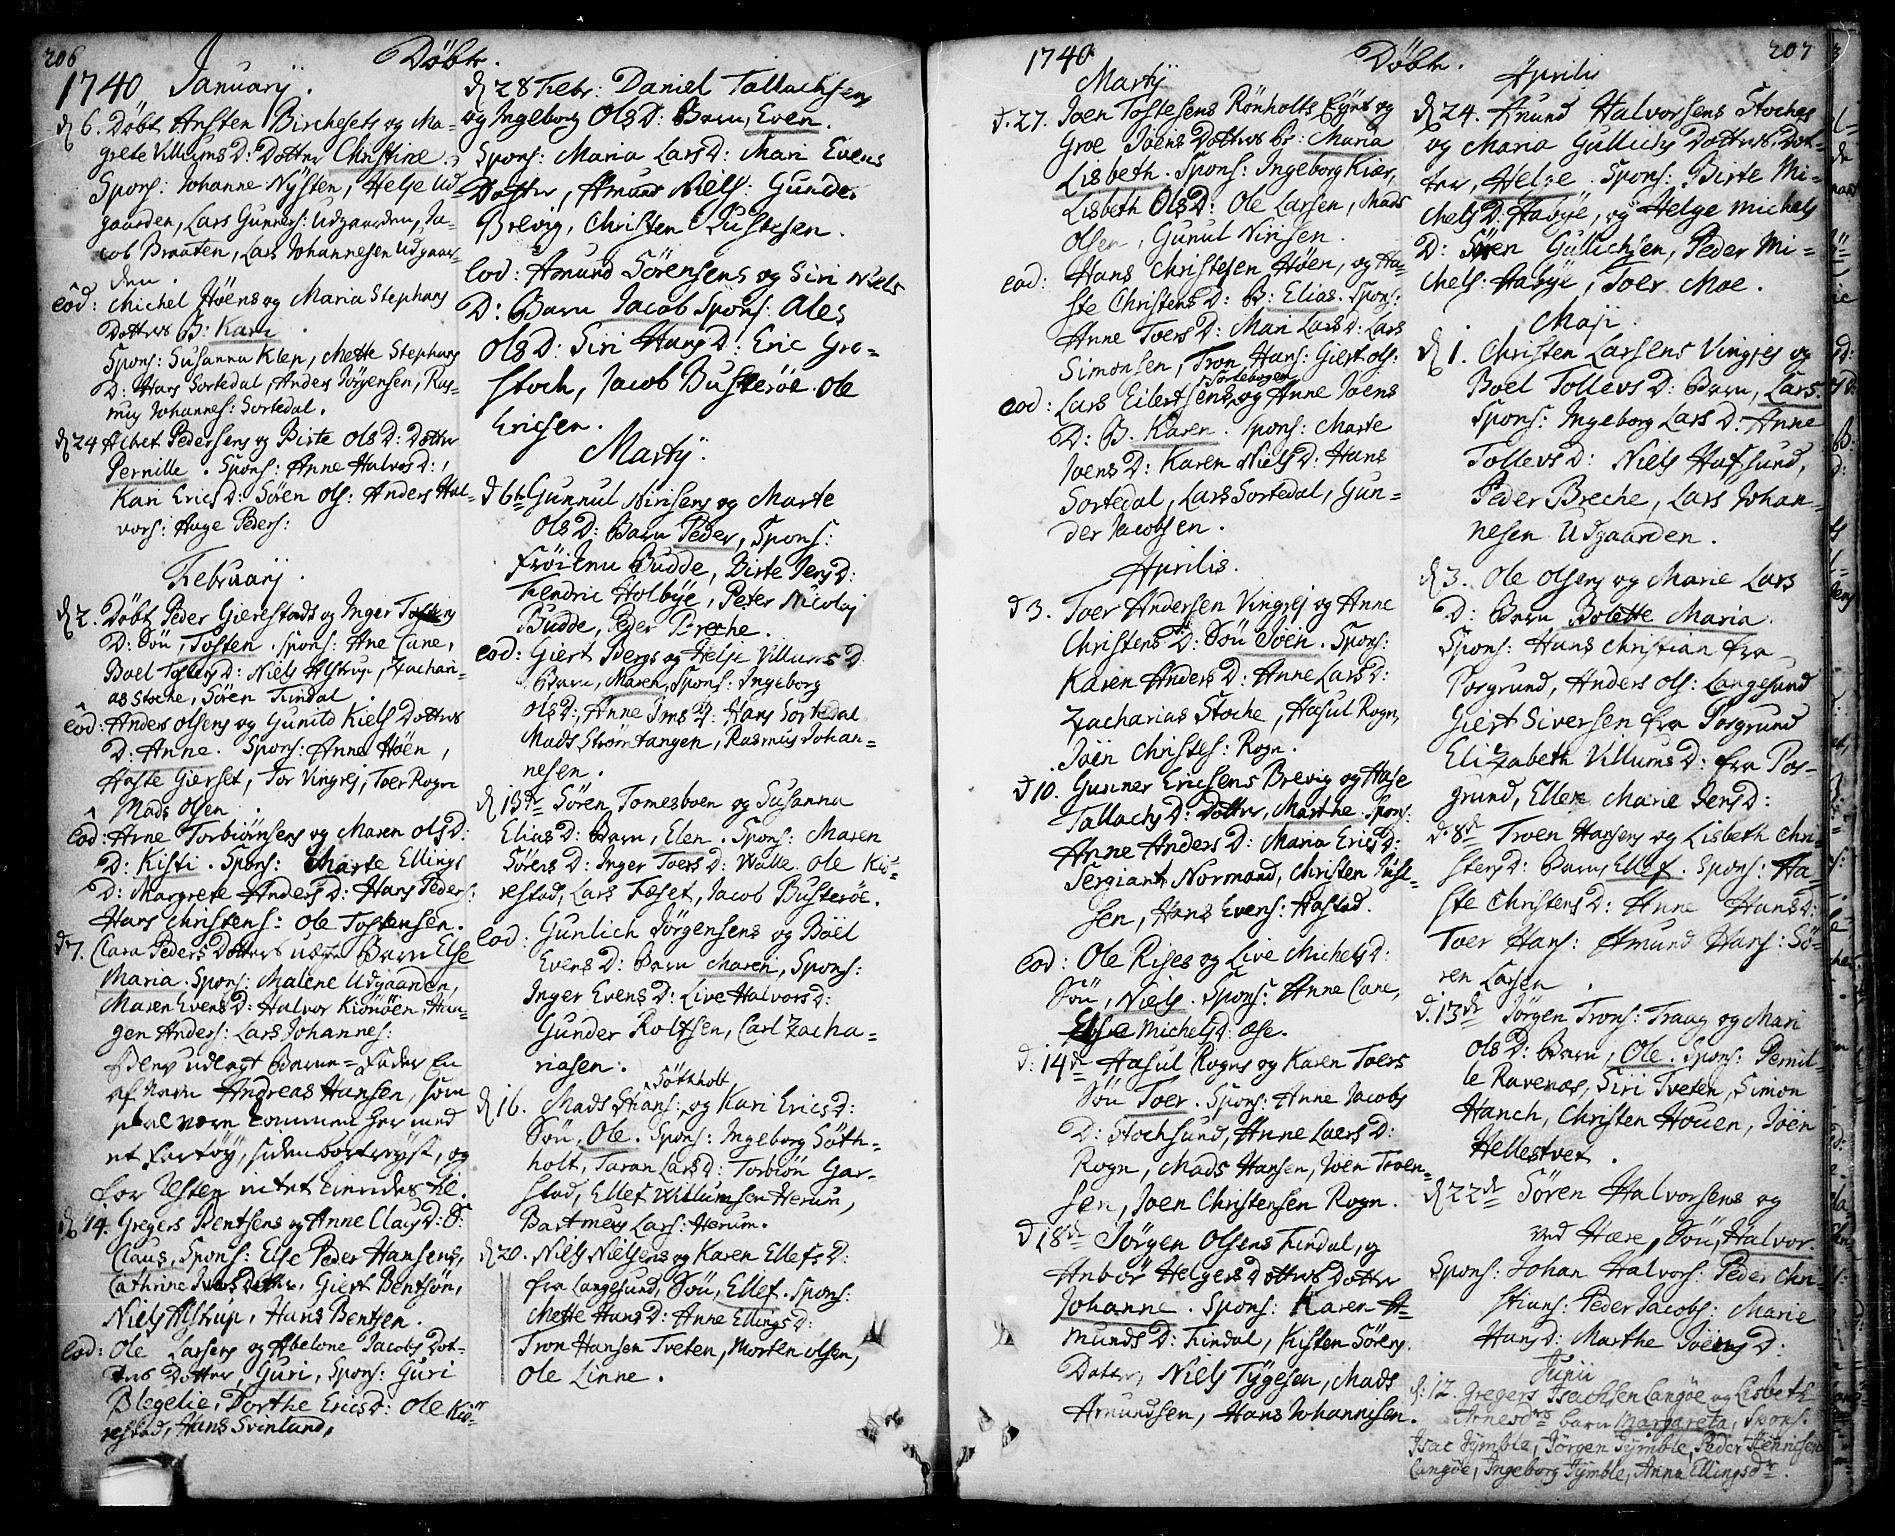 SAKO, Bamble kirkebøker, F/Fa/L0001: Ministerialbok nr. I 1, 1702-1774, s. 206-207